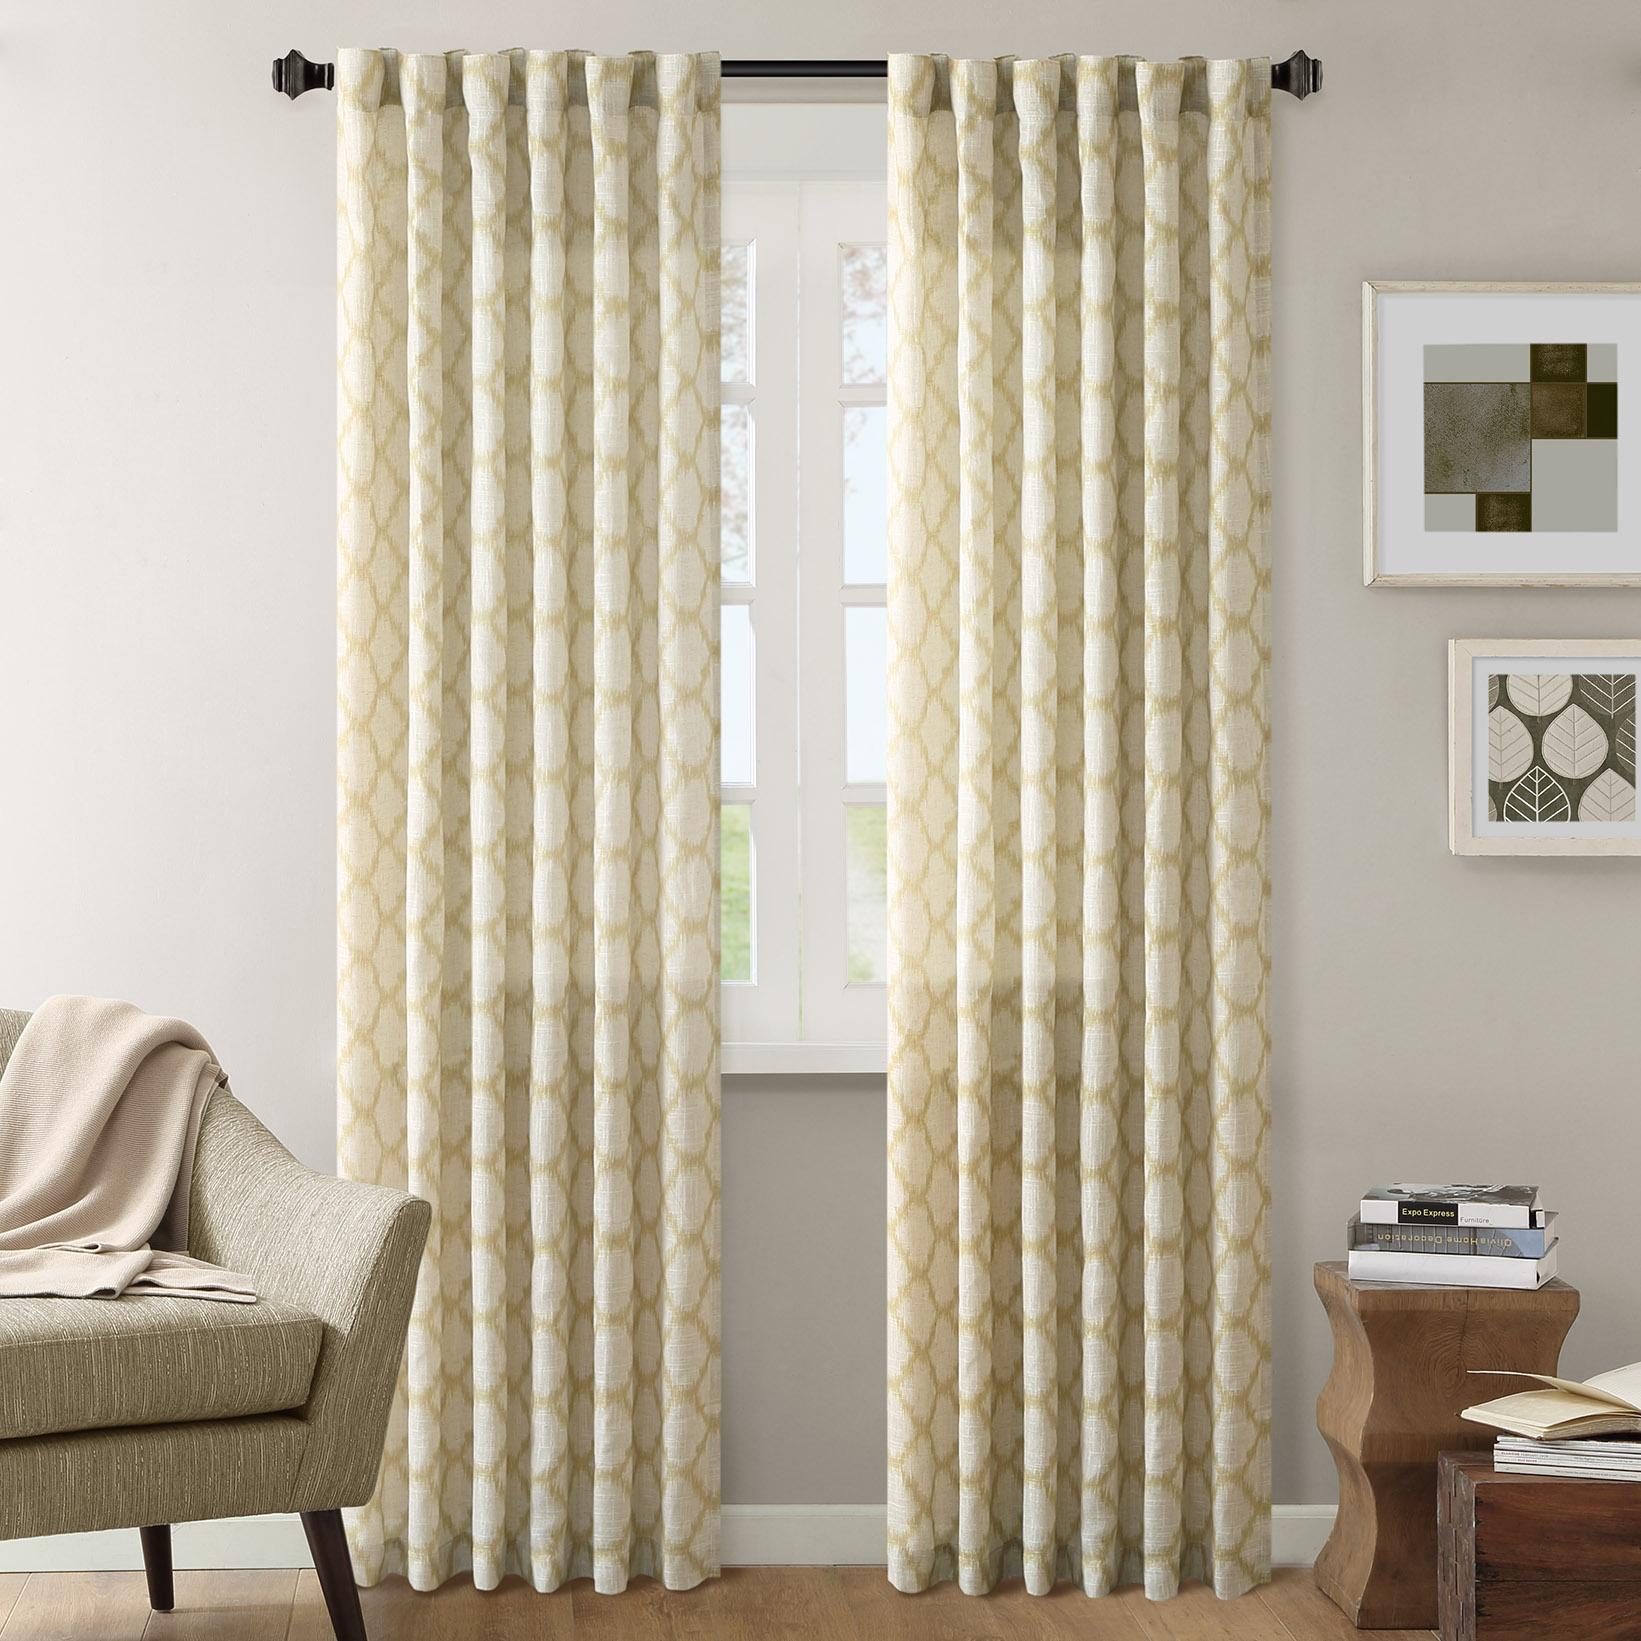 "INK+IVY - Nakita Window Curtain - Yellow - 95"" Panel"